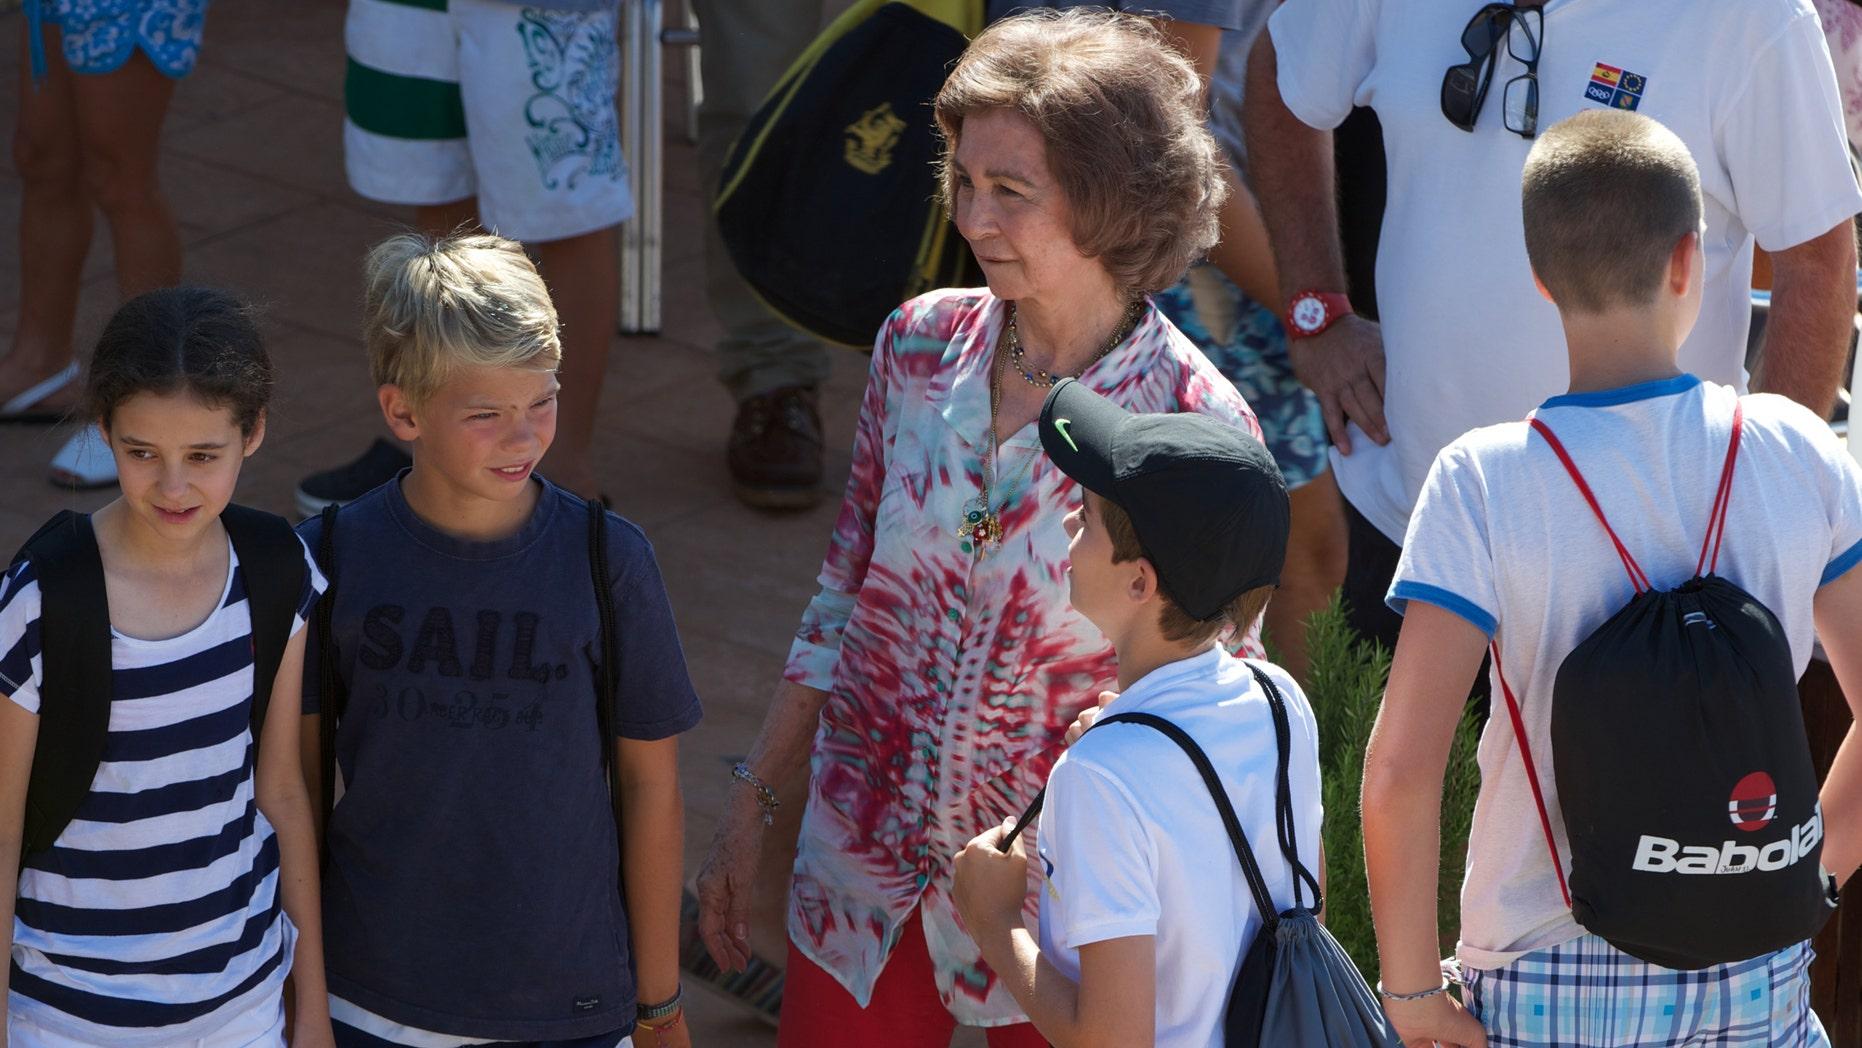 MALLORCA, SPAIN - JULY 29:  Queen Sofia of Spain (C) and her grandsons (L-R) Victoria Federica Marichalar, Pablo Nicolas Urdangarin, Miguel Urdangarin and Juan Valentin Urdangarin arrive at Calanova Sailing School on July 29, 2013 in Palma de Mallorca, Spain.  (Photo by Carlos Alvarez/Getty Images)